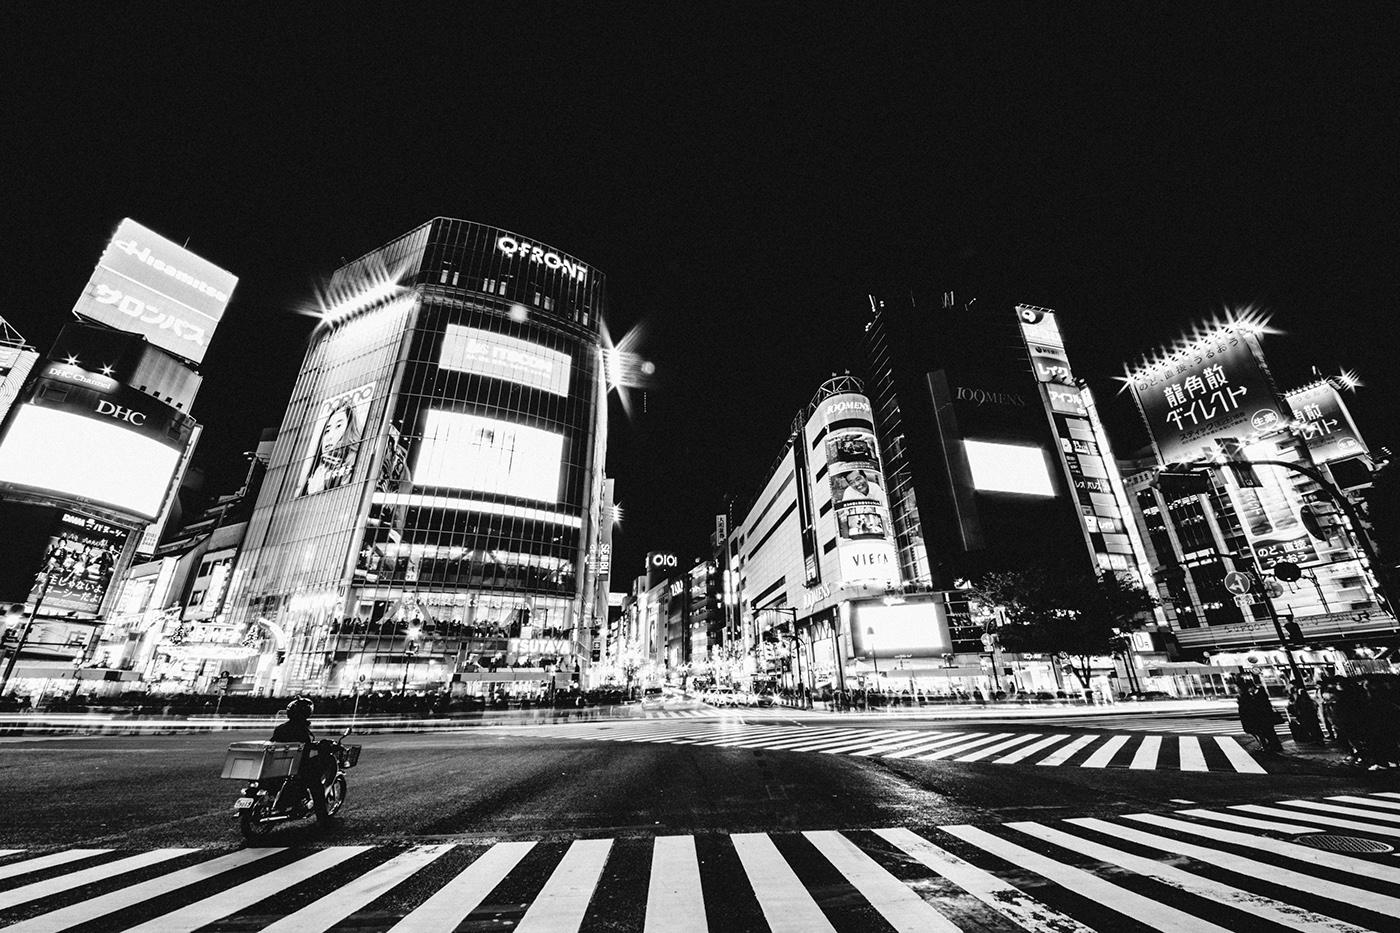 tokyo japan Street streetphotography SHIBUYA Sushi people black and white lights city